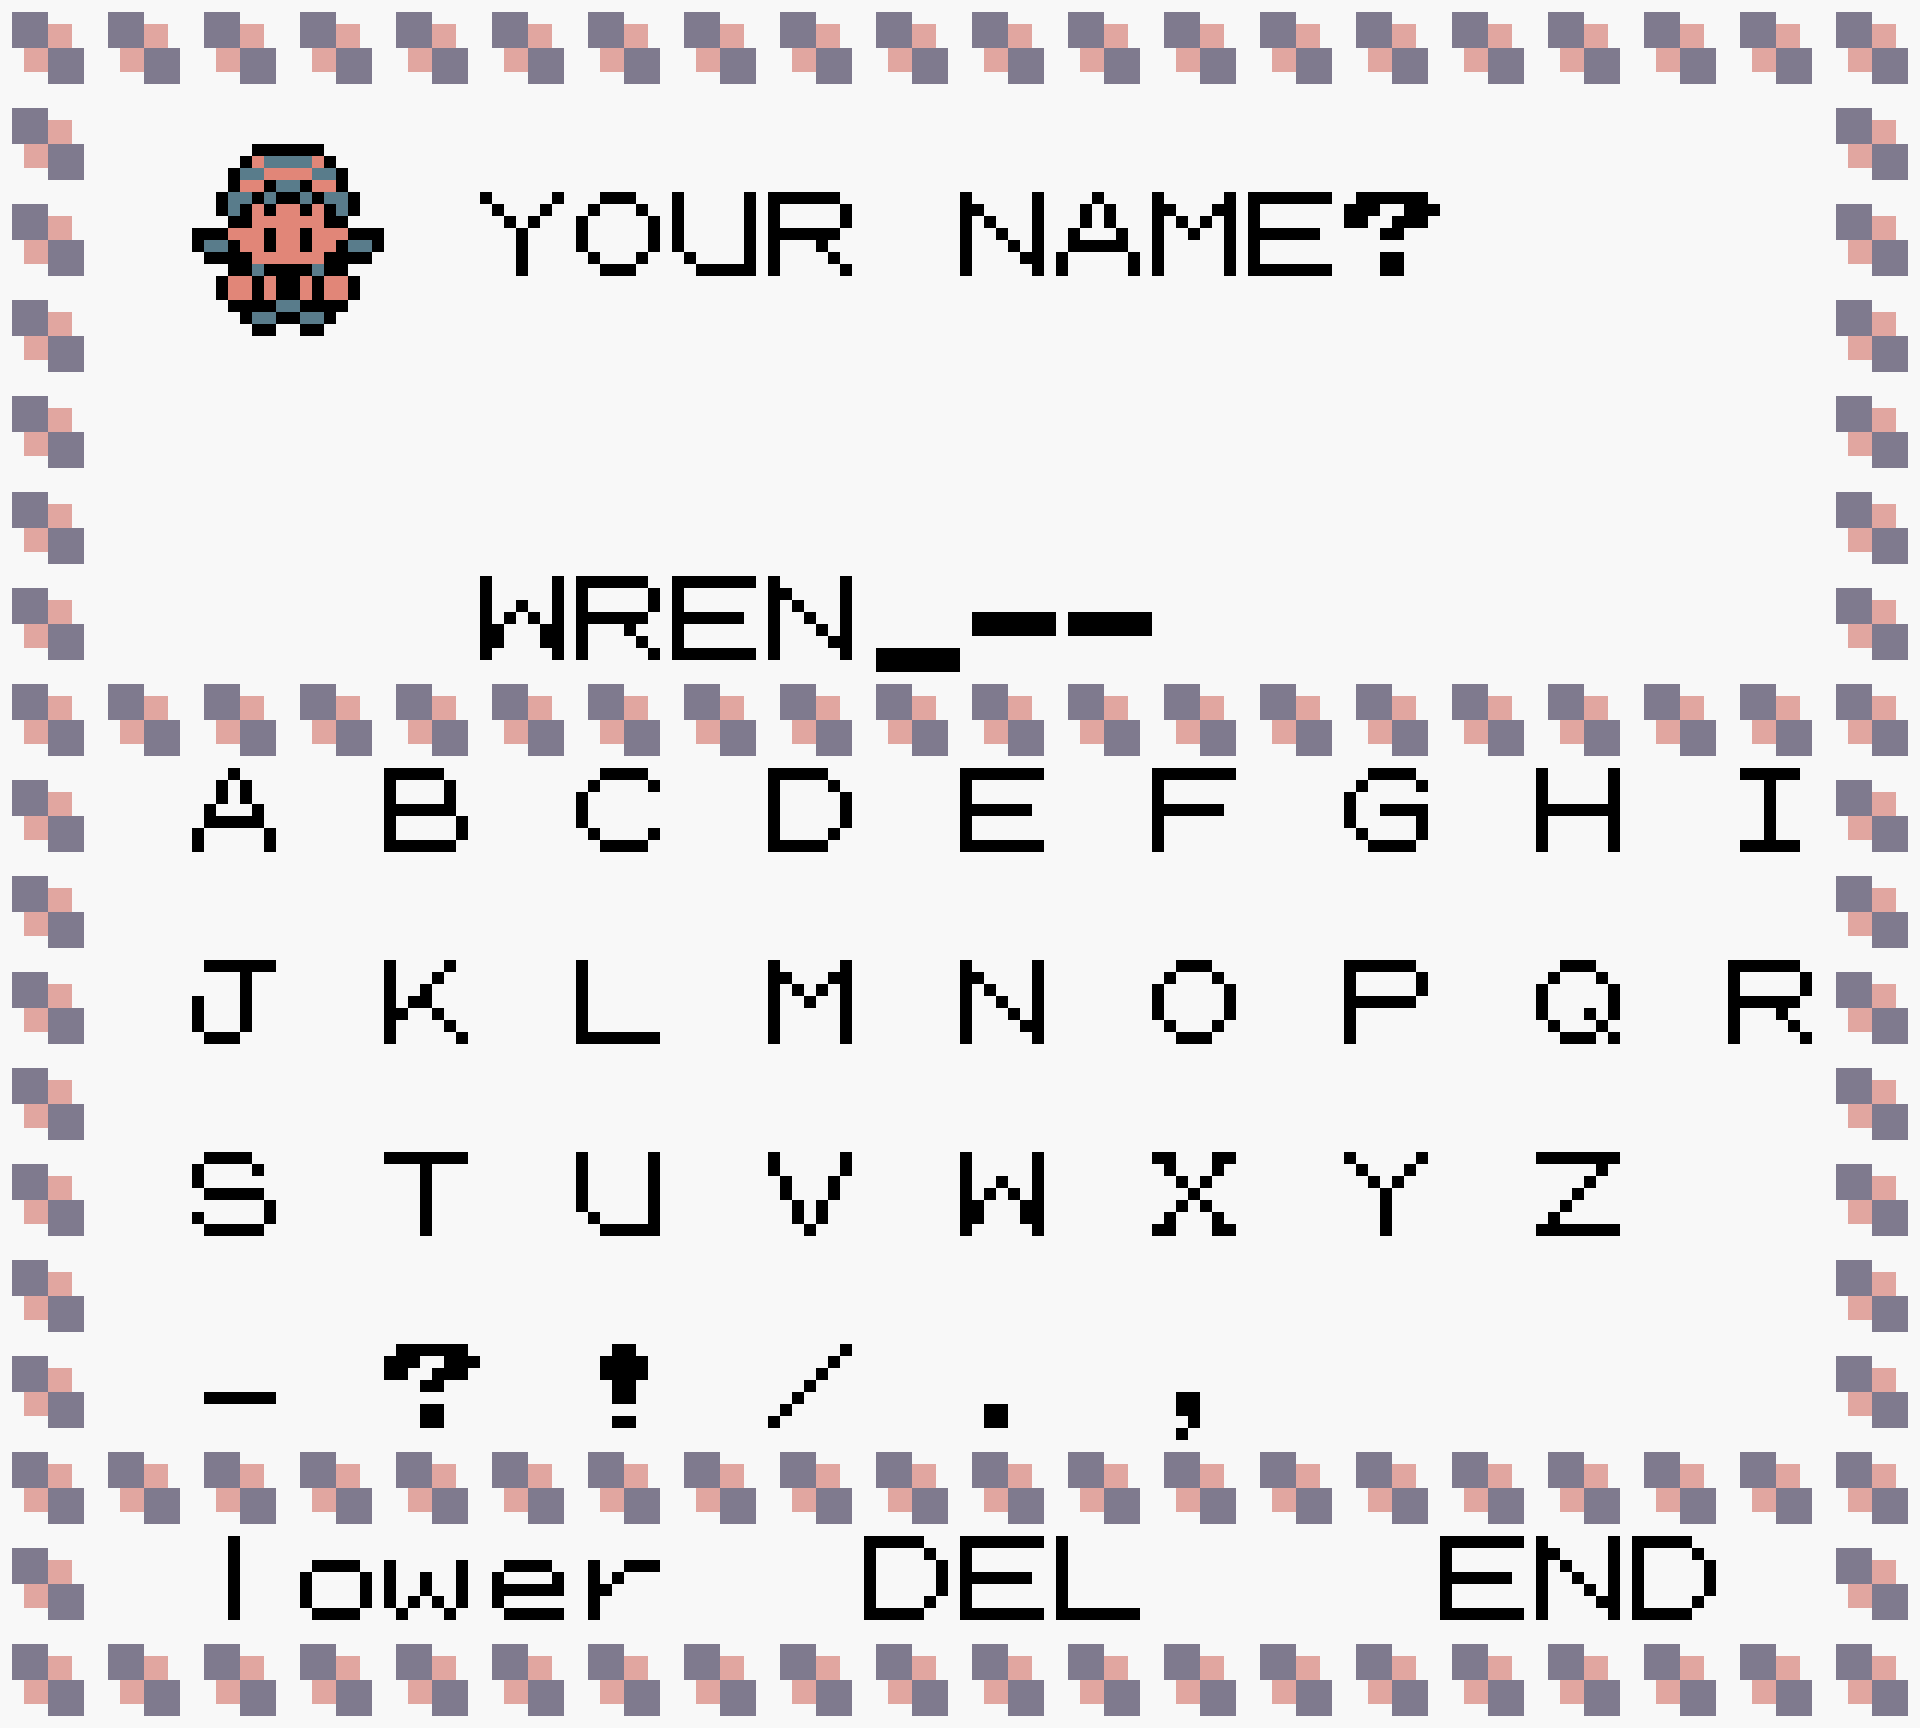 Pokemon_Crystal_Nuzlocke_2021-10-10_23.47.27.png